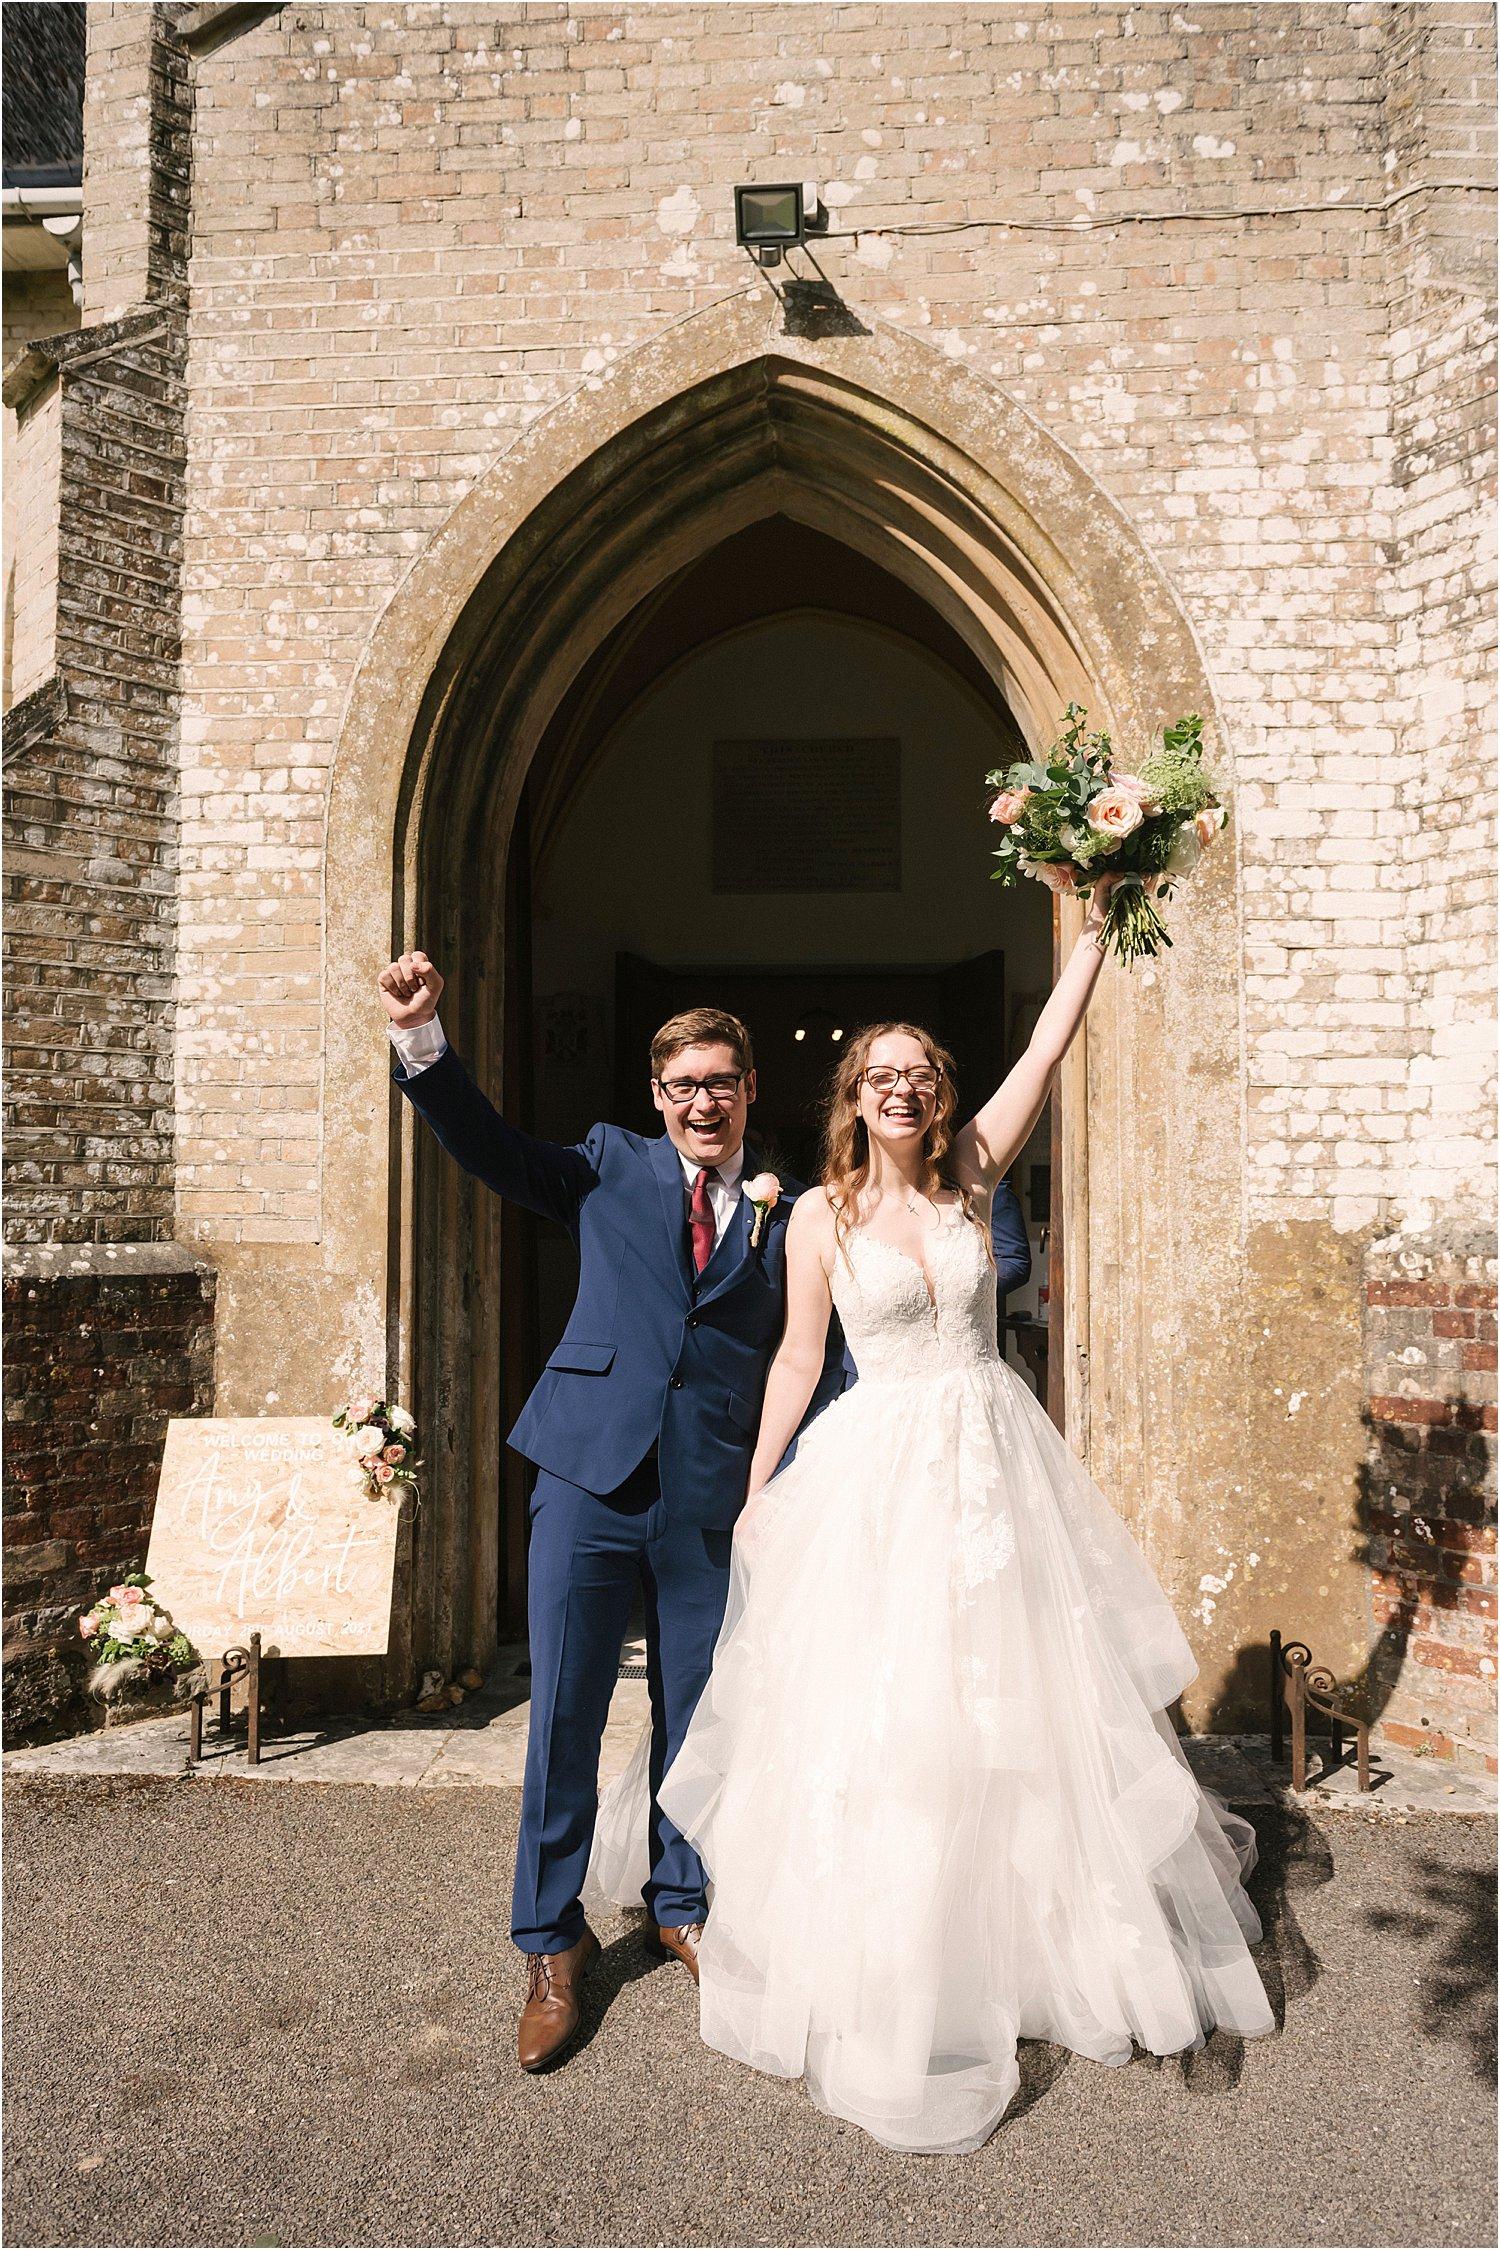 dorset-wedding-upton-house-amy-albert-wedding-lily-sawyer-photography